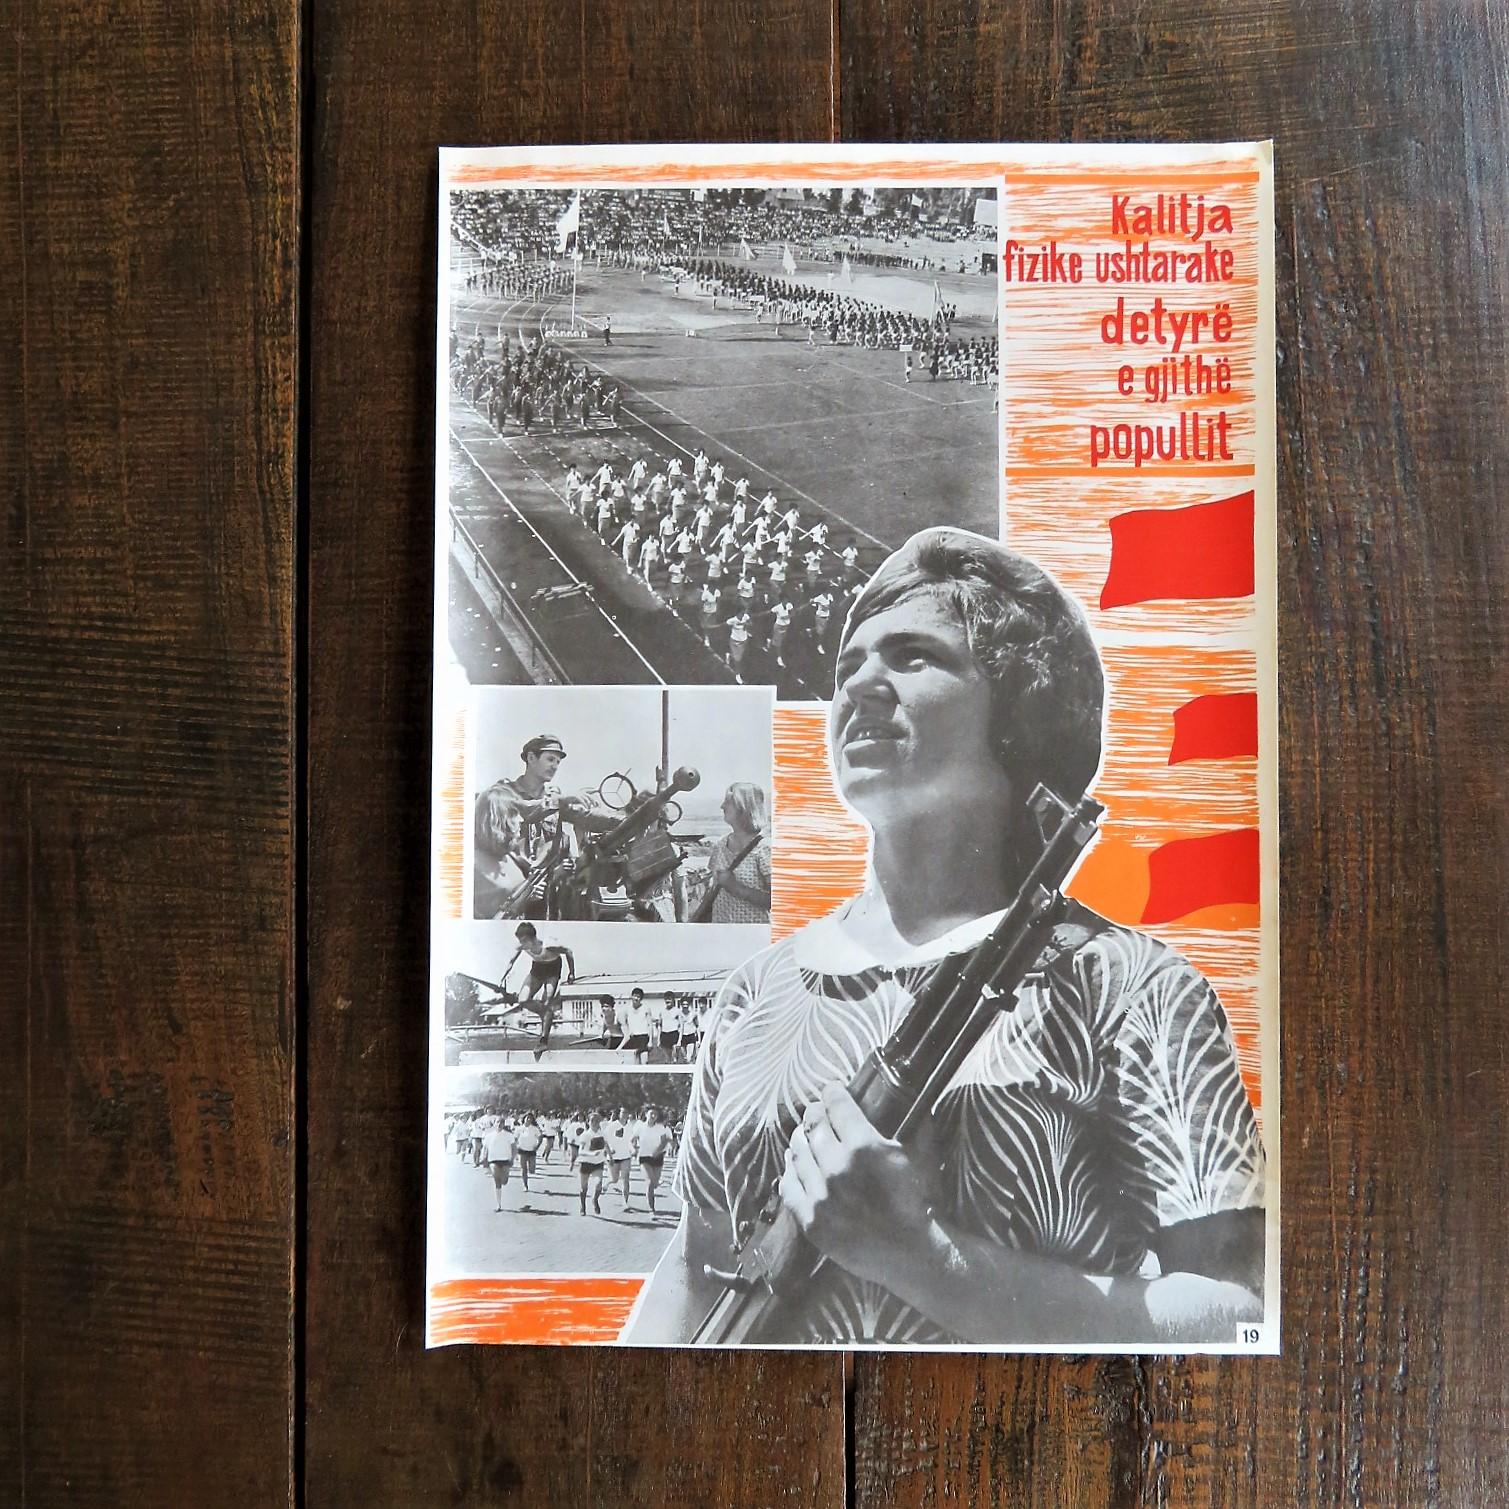 poster-albania-1-6